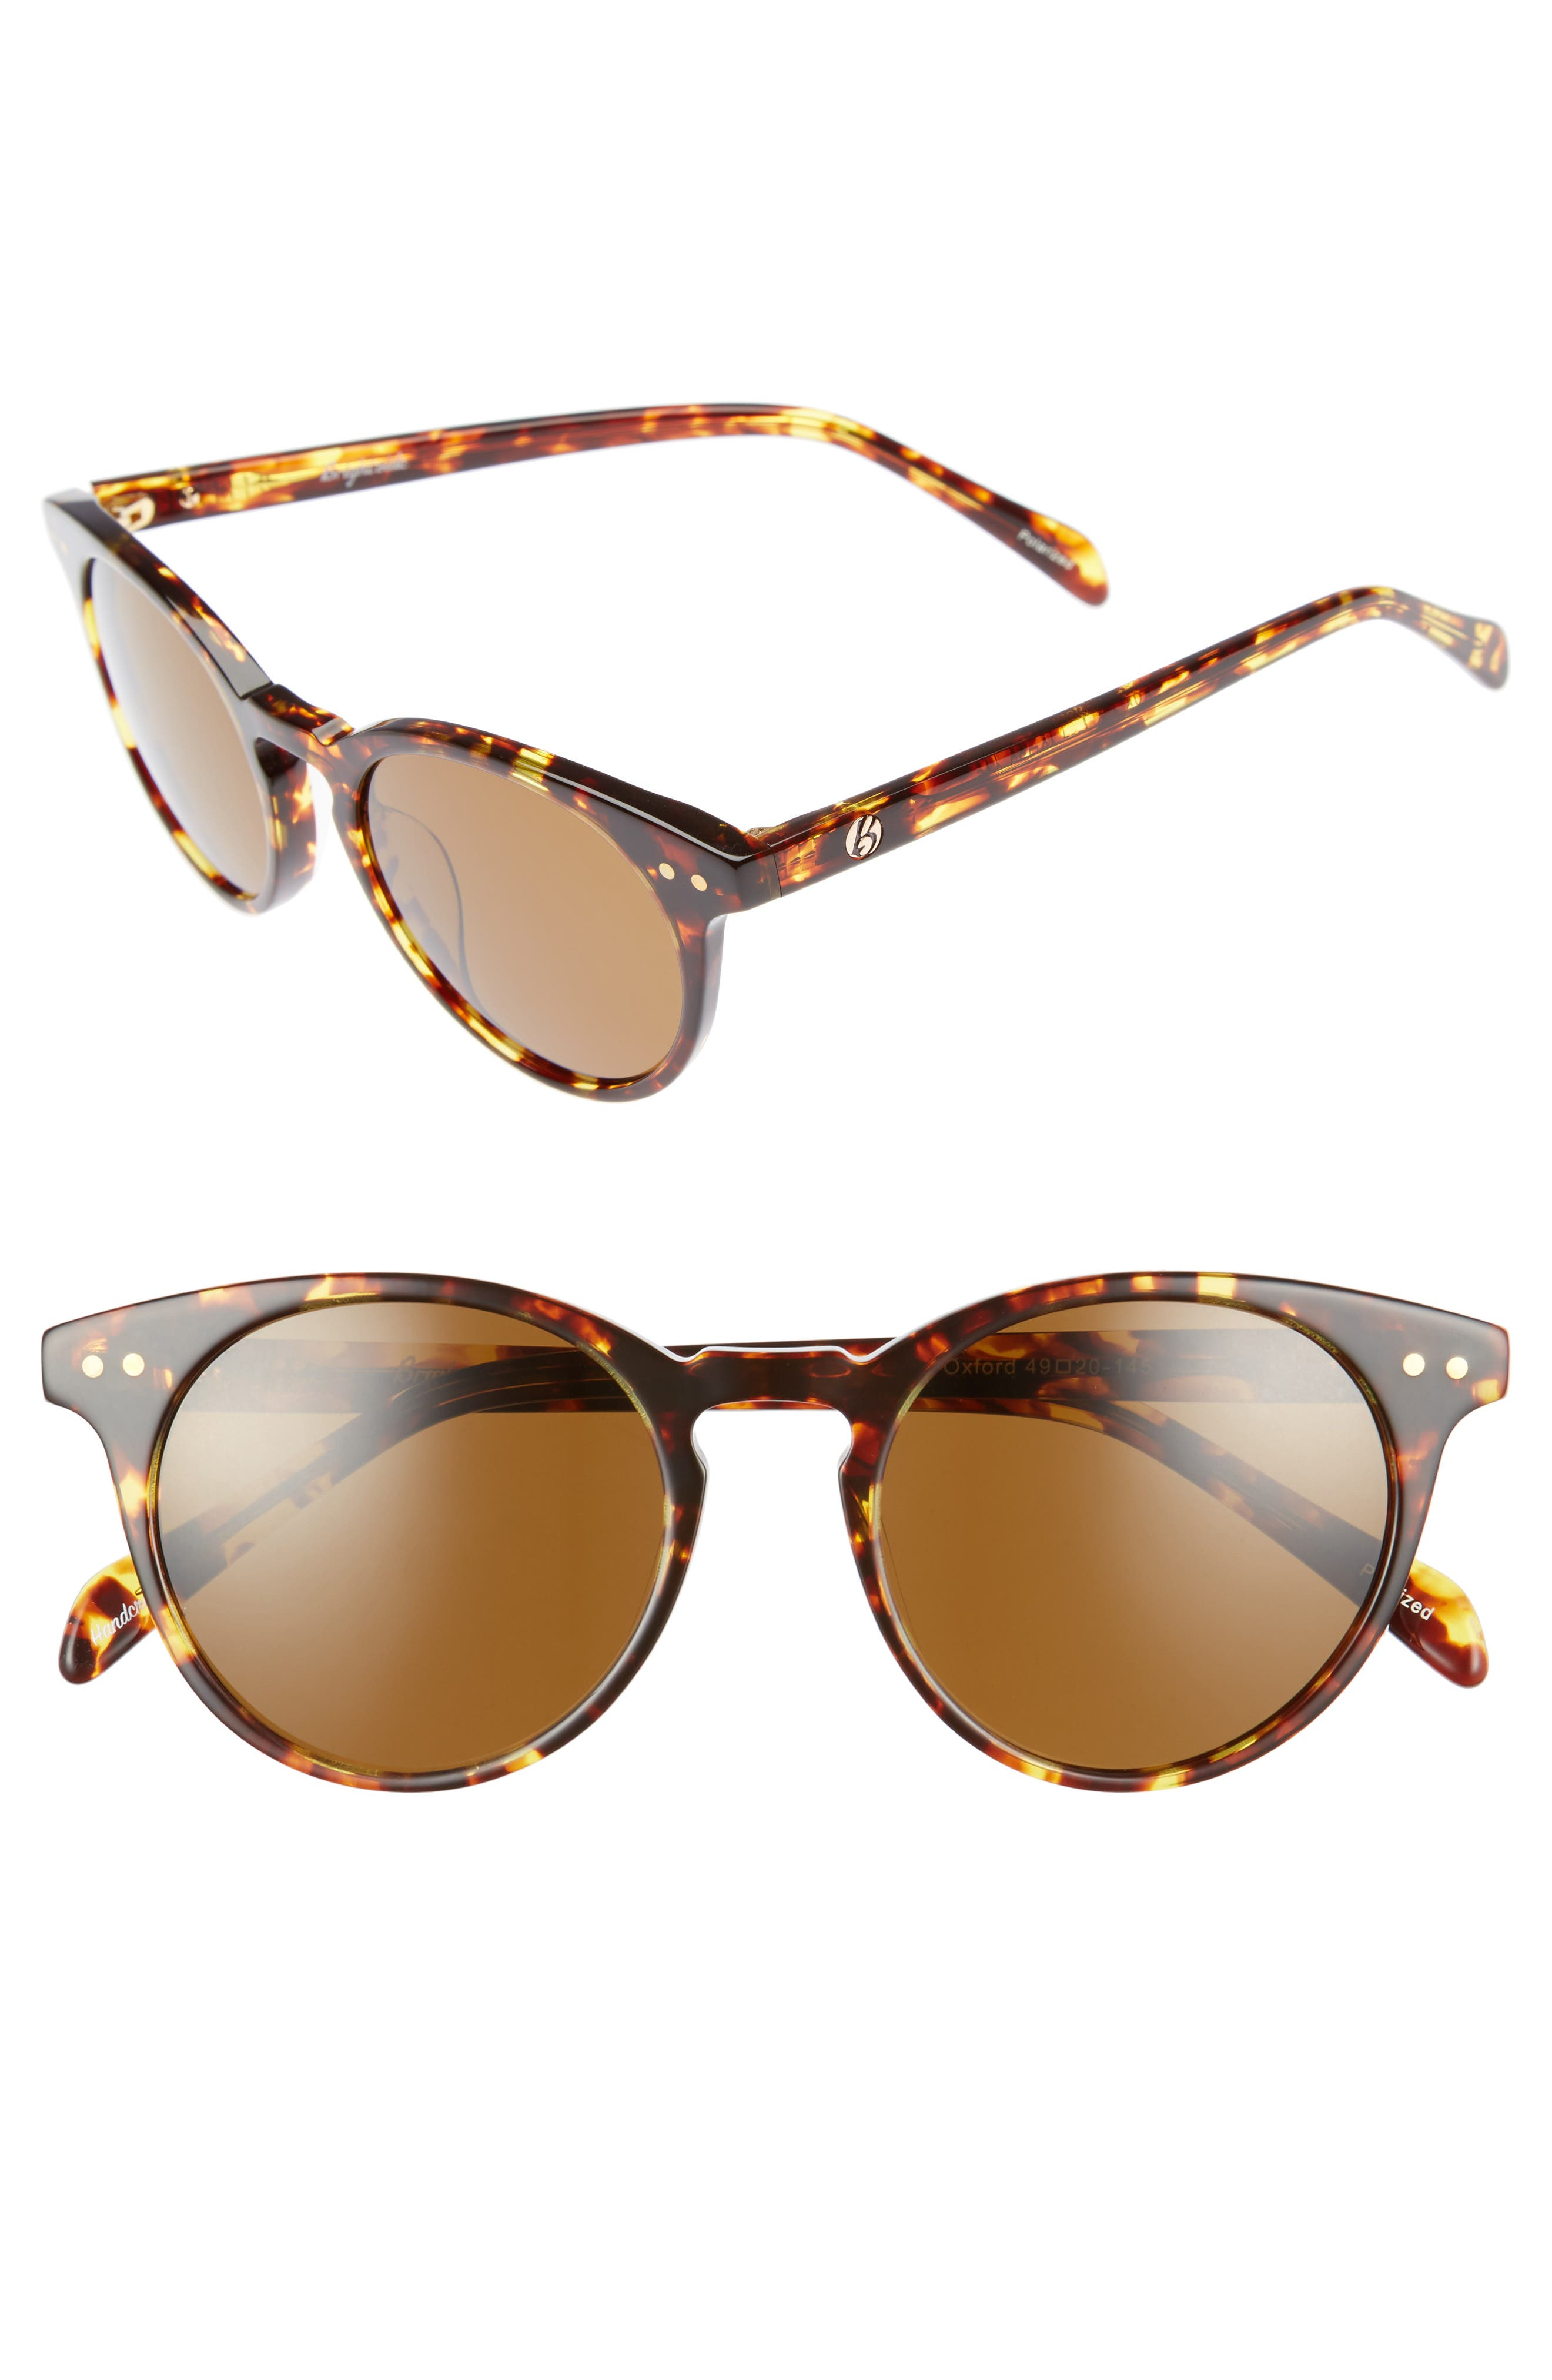 Main Image - Brightside Oxford 49mm Polarized Sunglasses